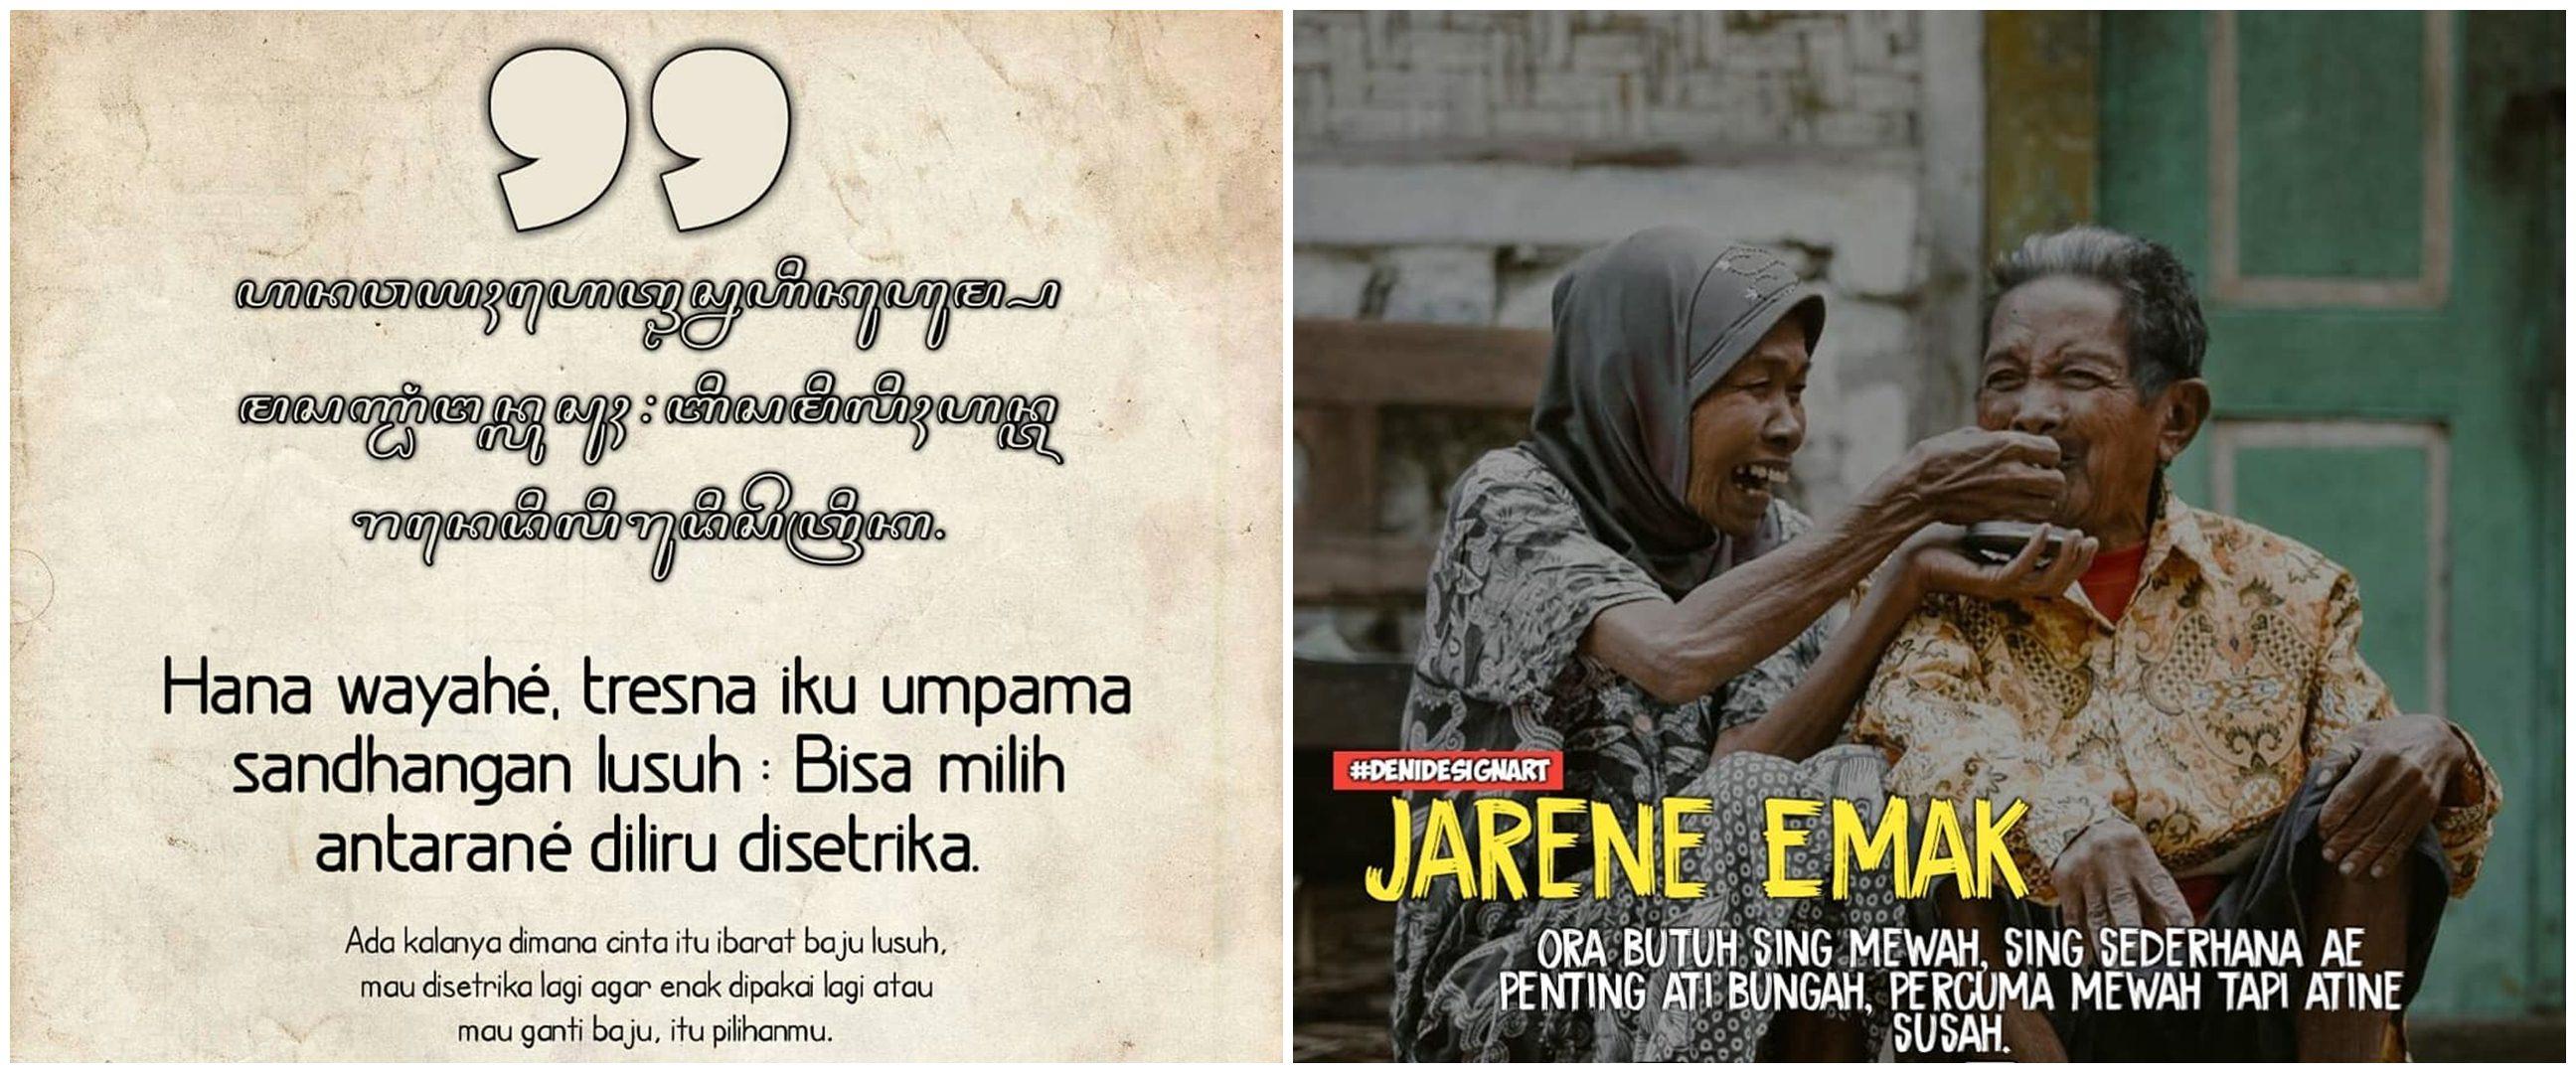 40 Kata-kata keren bahasa Jawa, penuh makna & motivasi